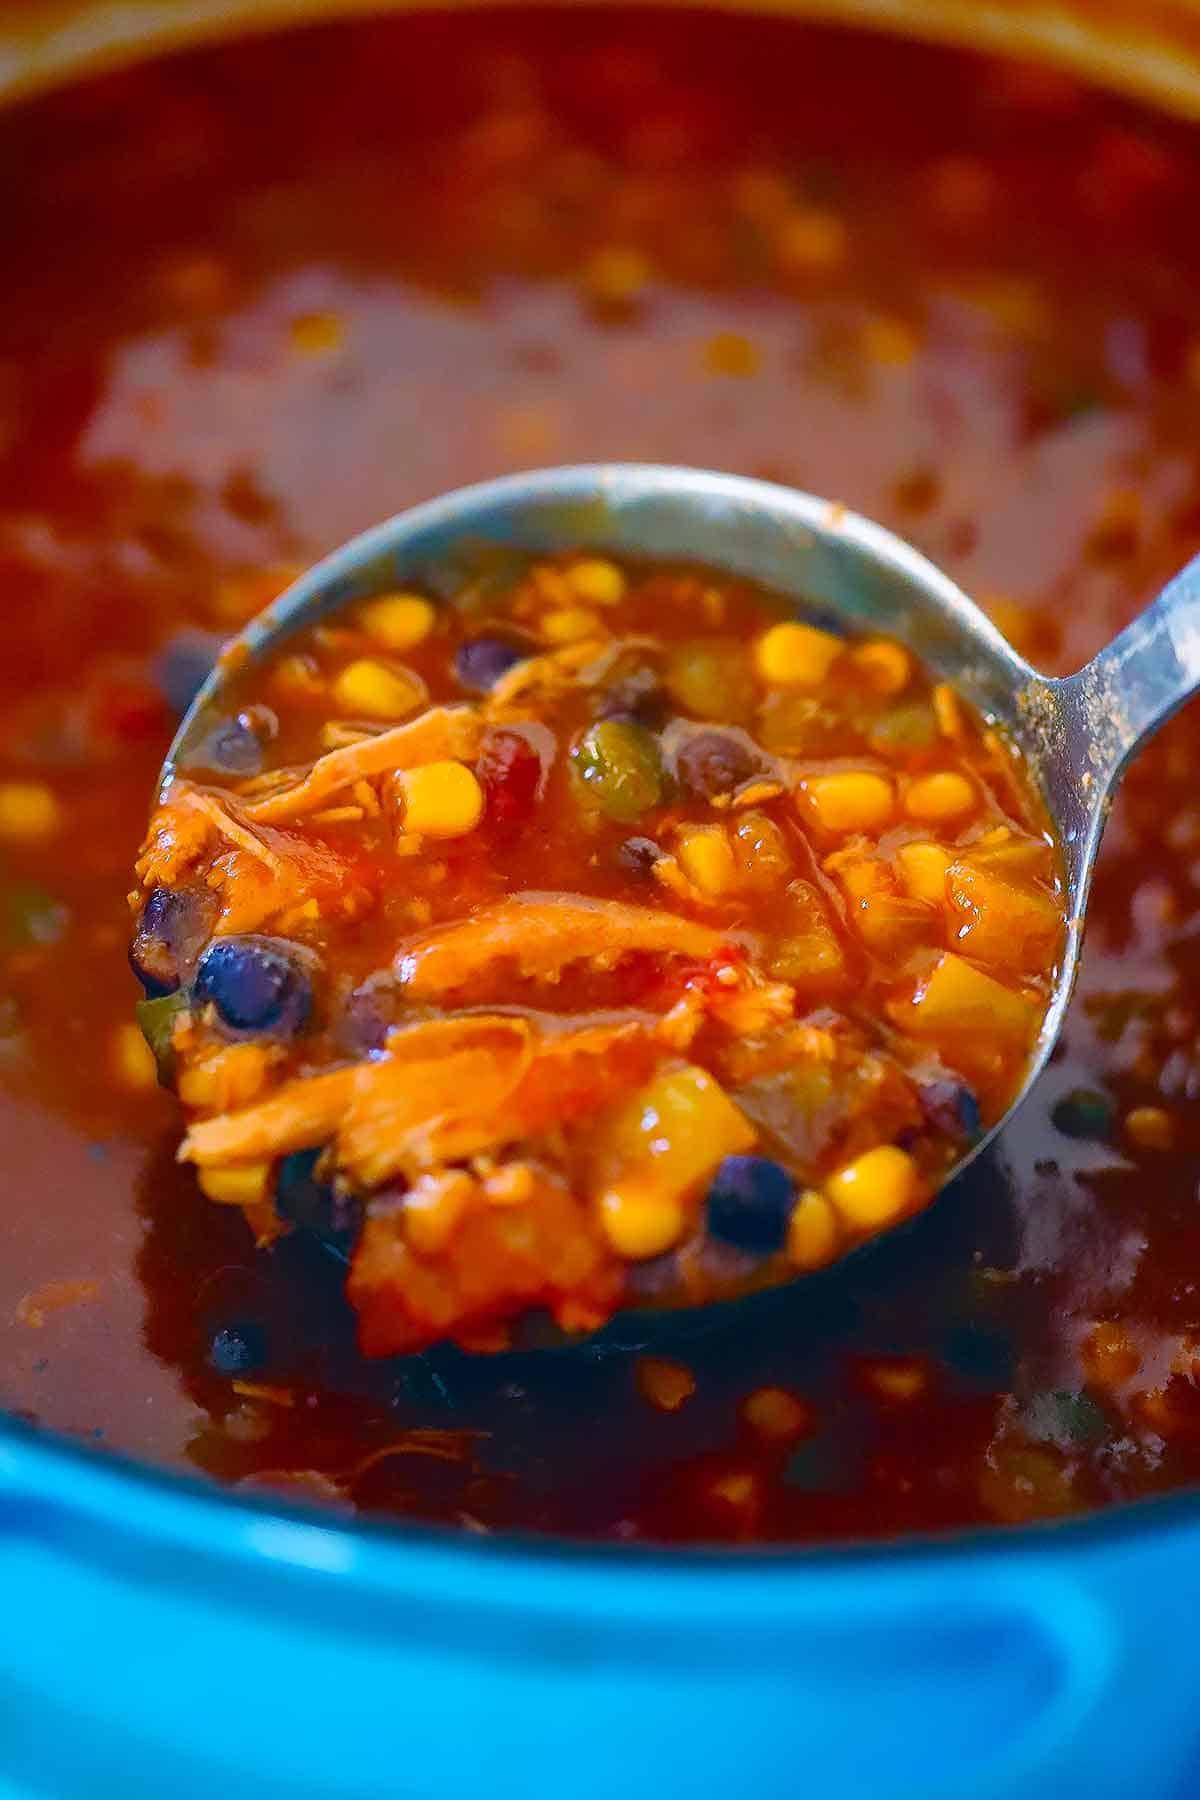 Close up ladle full of tortilla soup.